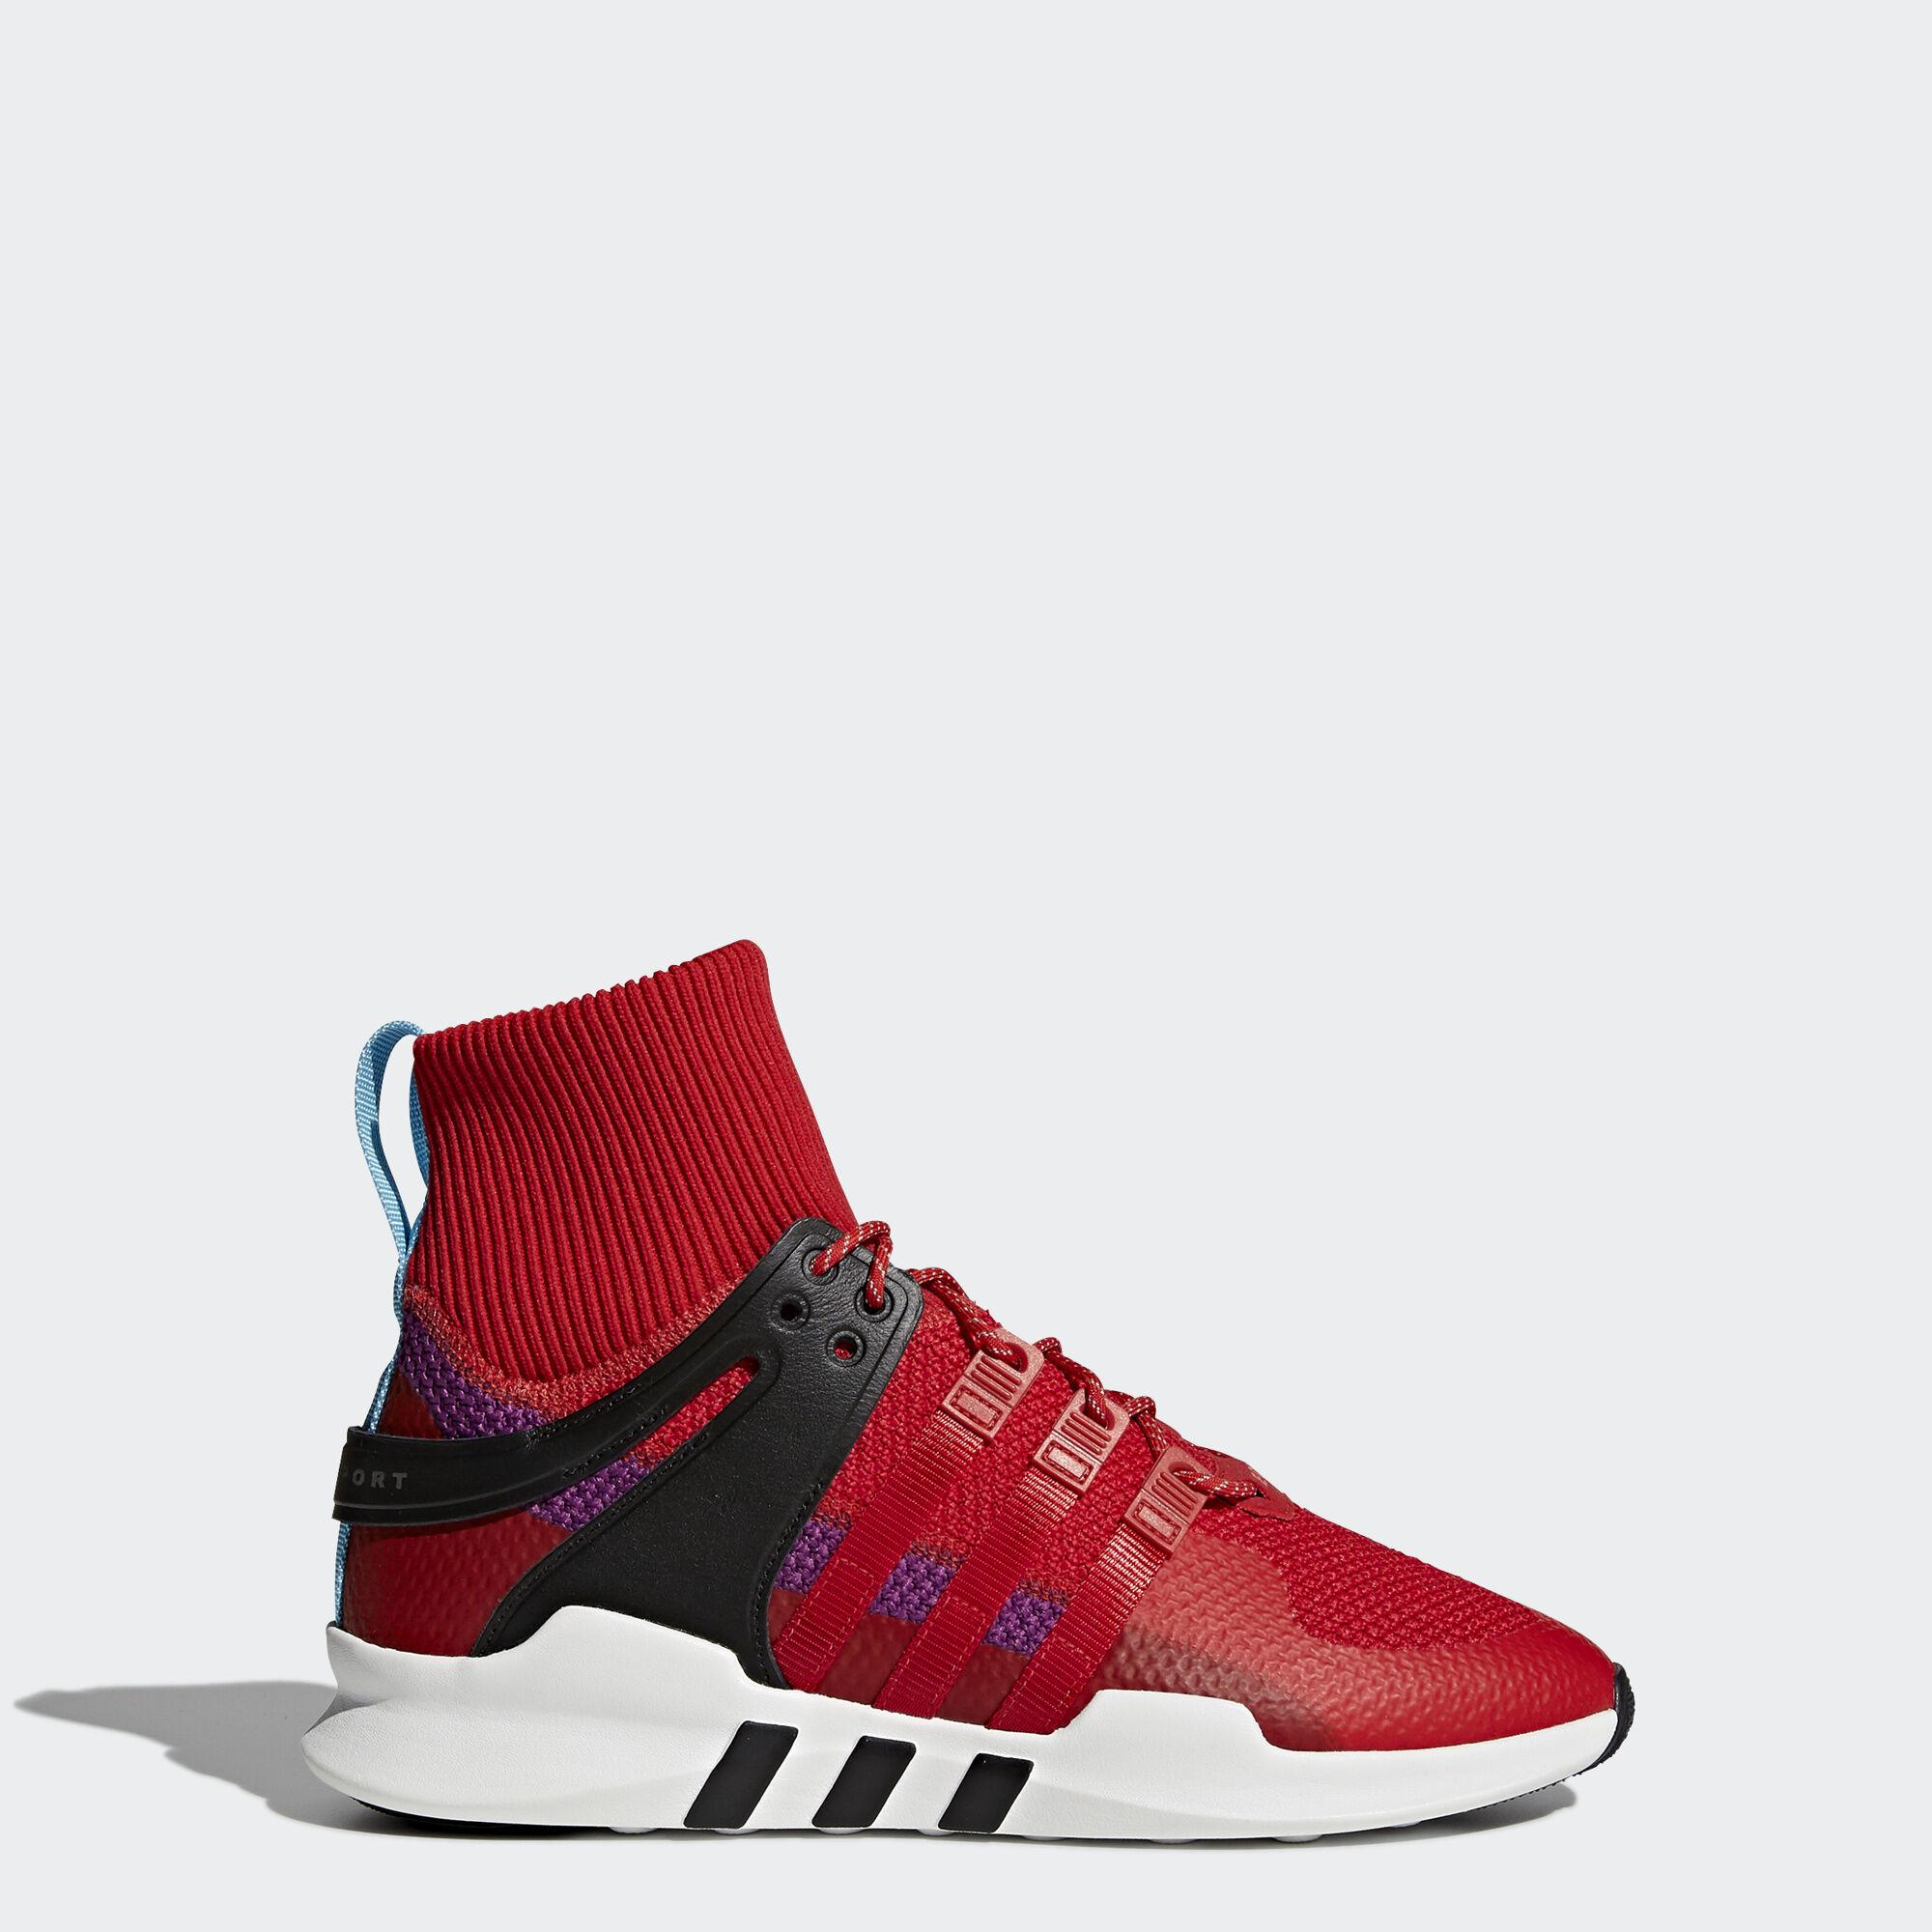 adidas eqt support adv winter sneaker